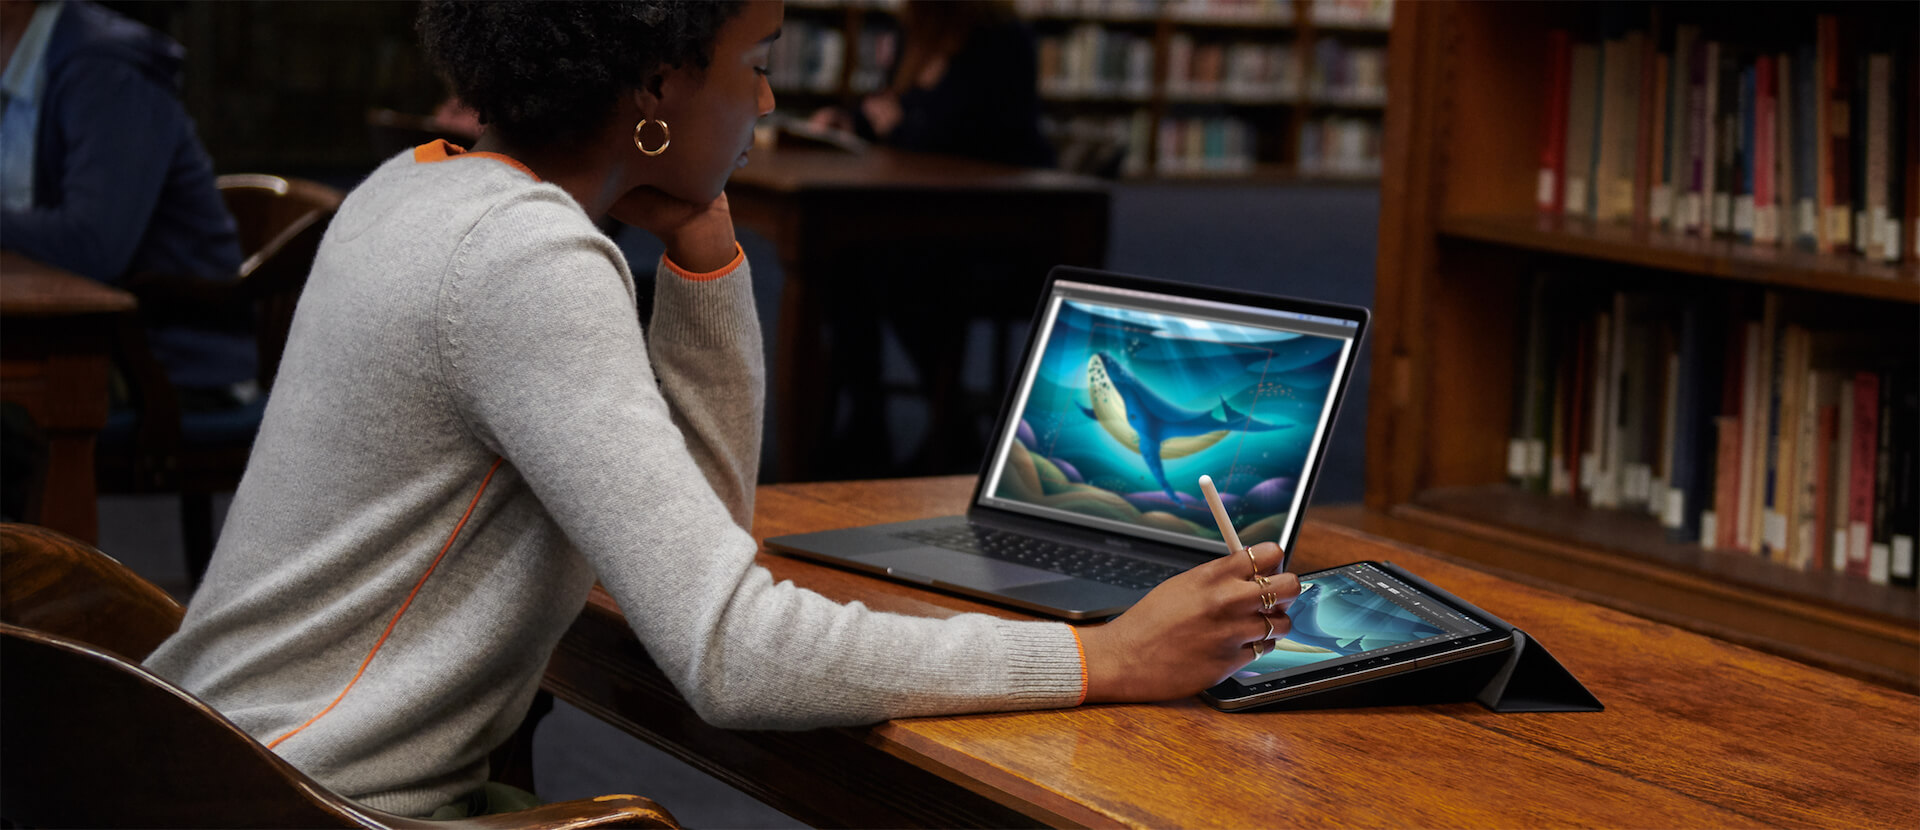 MacBookをさらに快適に!Apple「MacOS Catalina」がついにリリース tech191008_macos_catalina_2